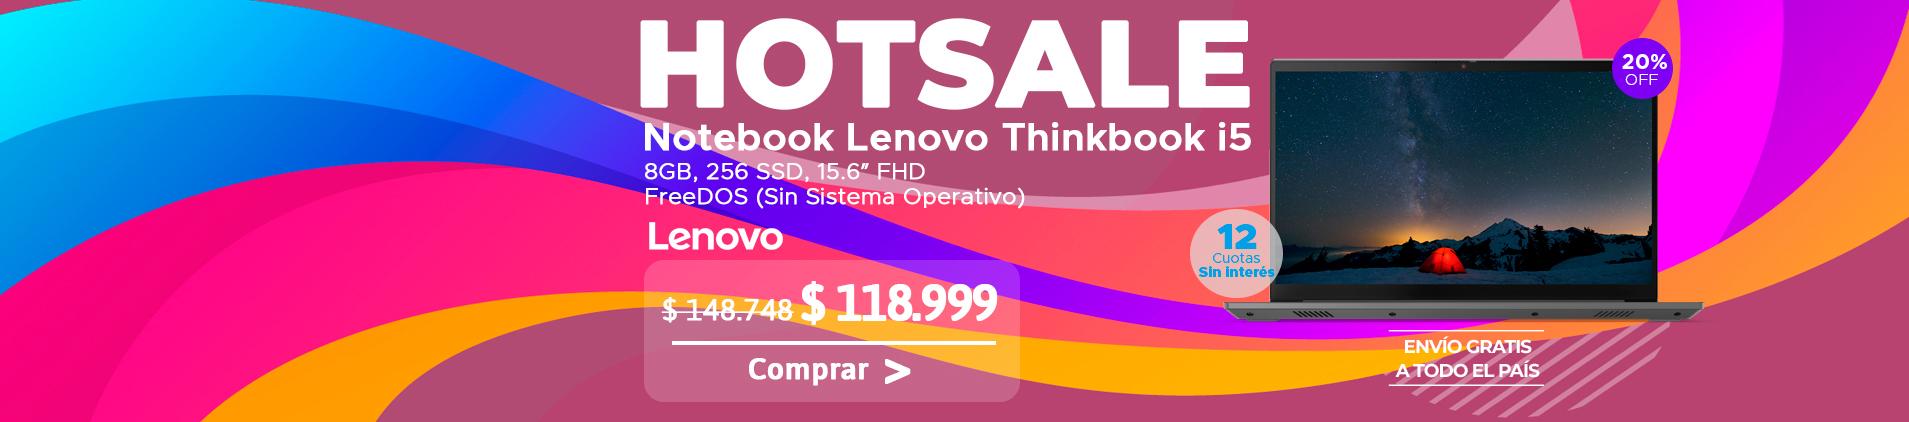 Notebook Lenovo Thinkbook i5